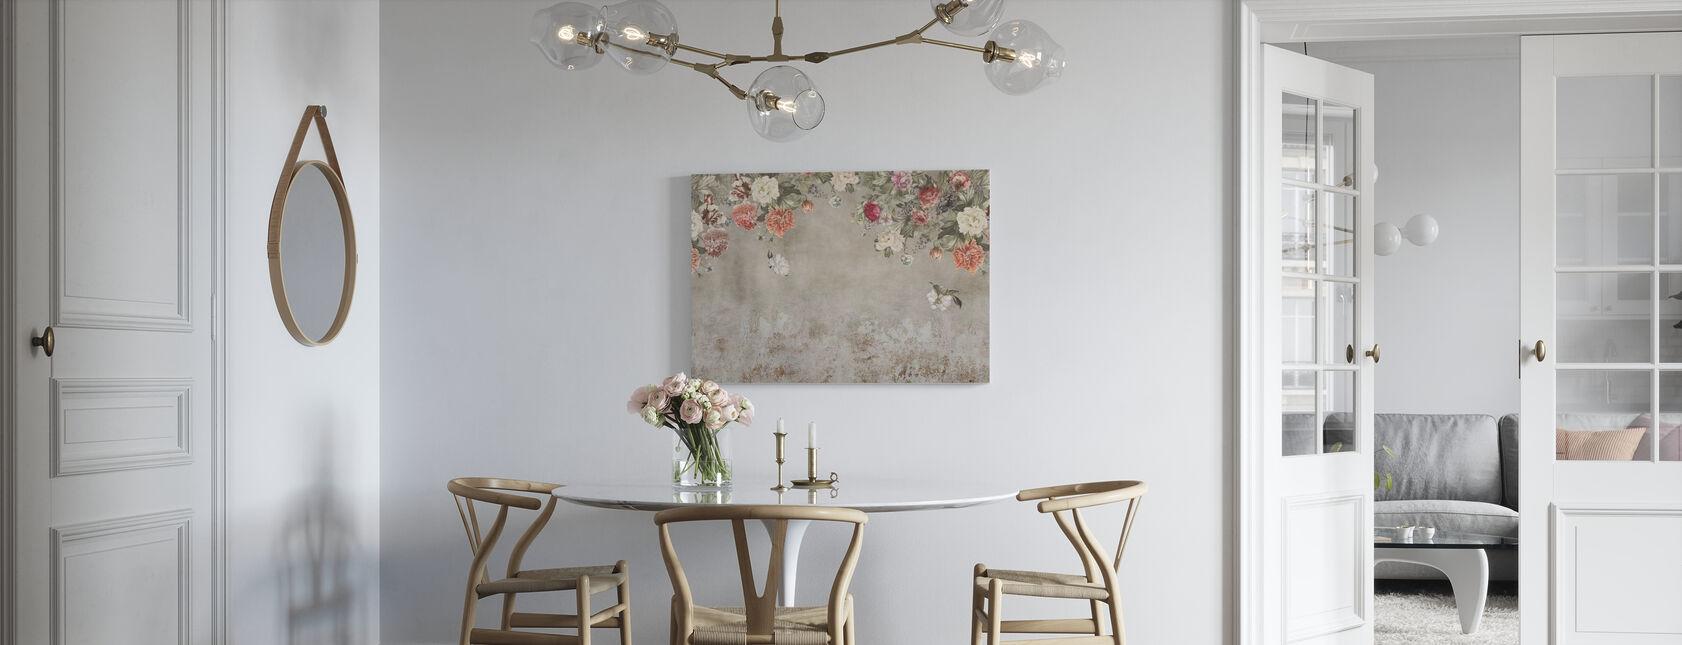 Vintage Flower Wall - Stampa su tela - Cucina